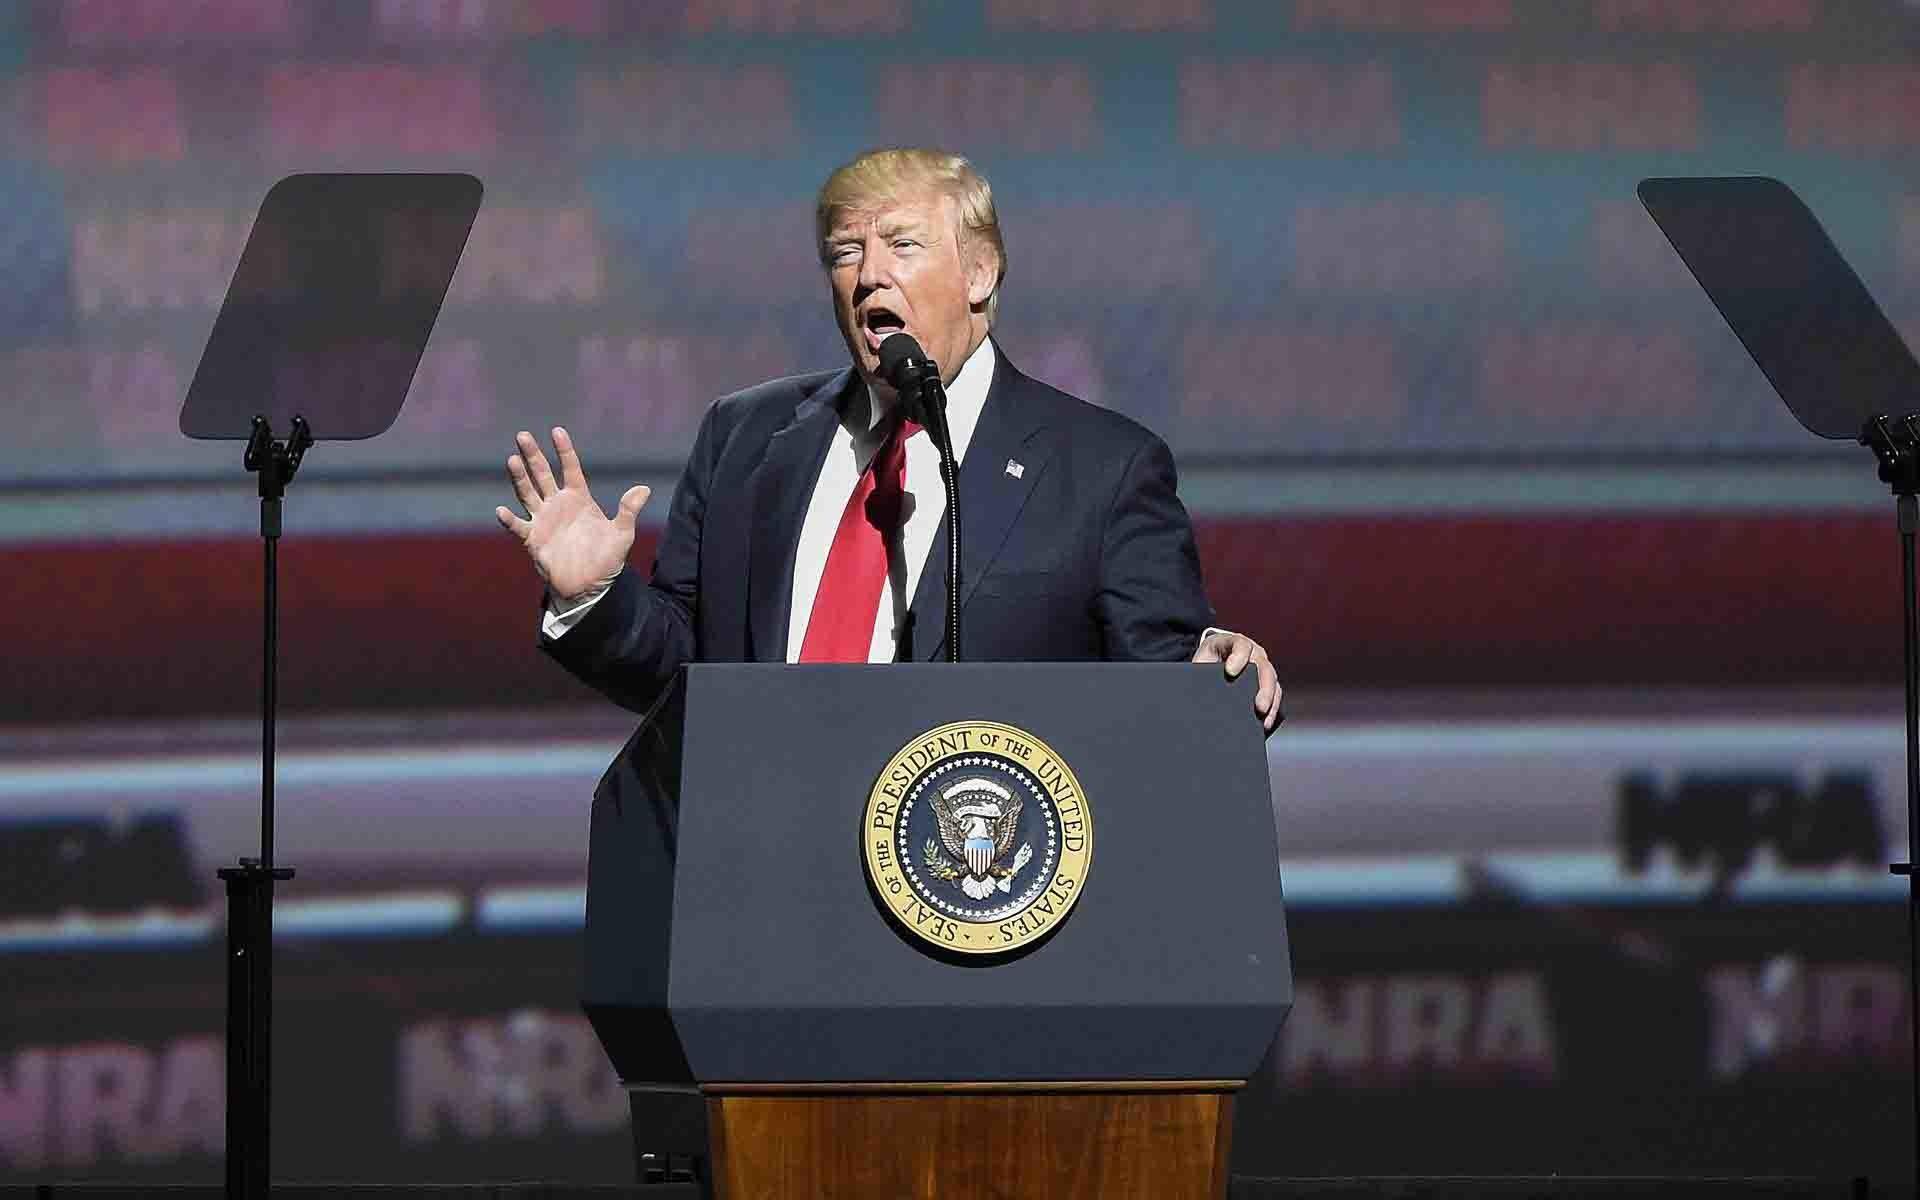 … Donald-Trump-HD-Wallpapers-Free-Download-For-Desktop- …